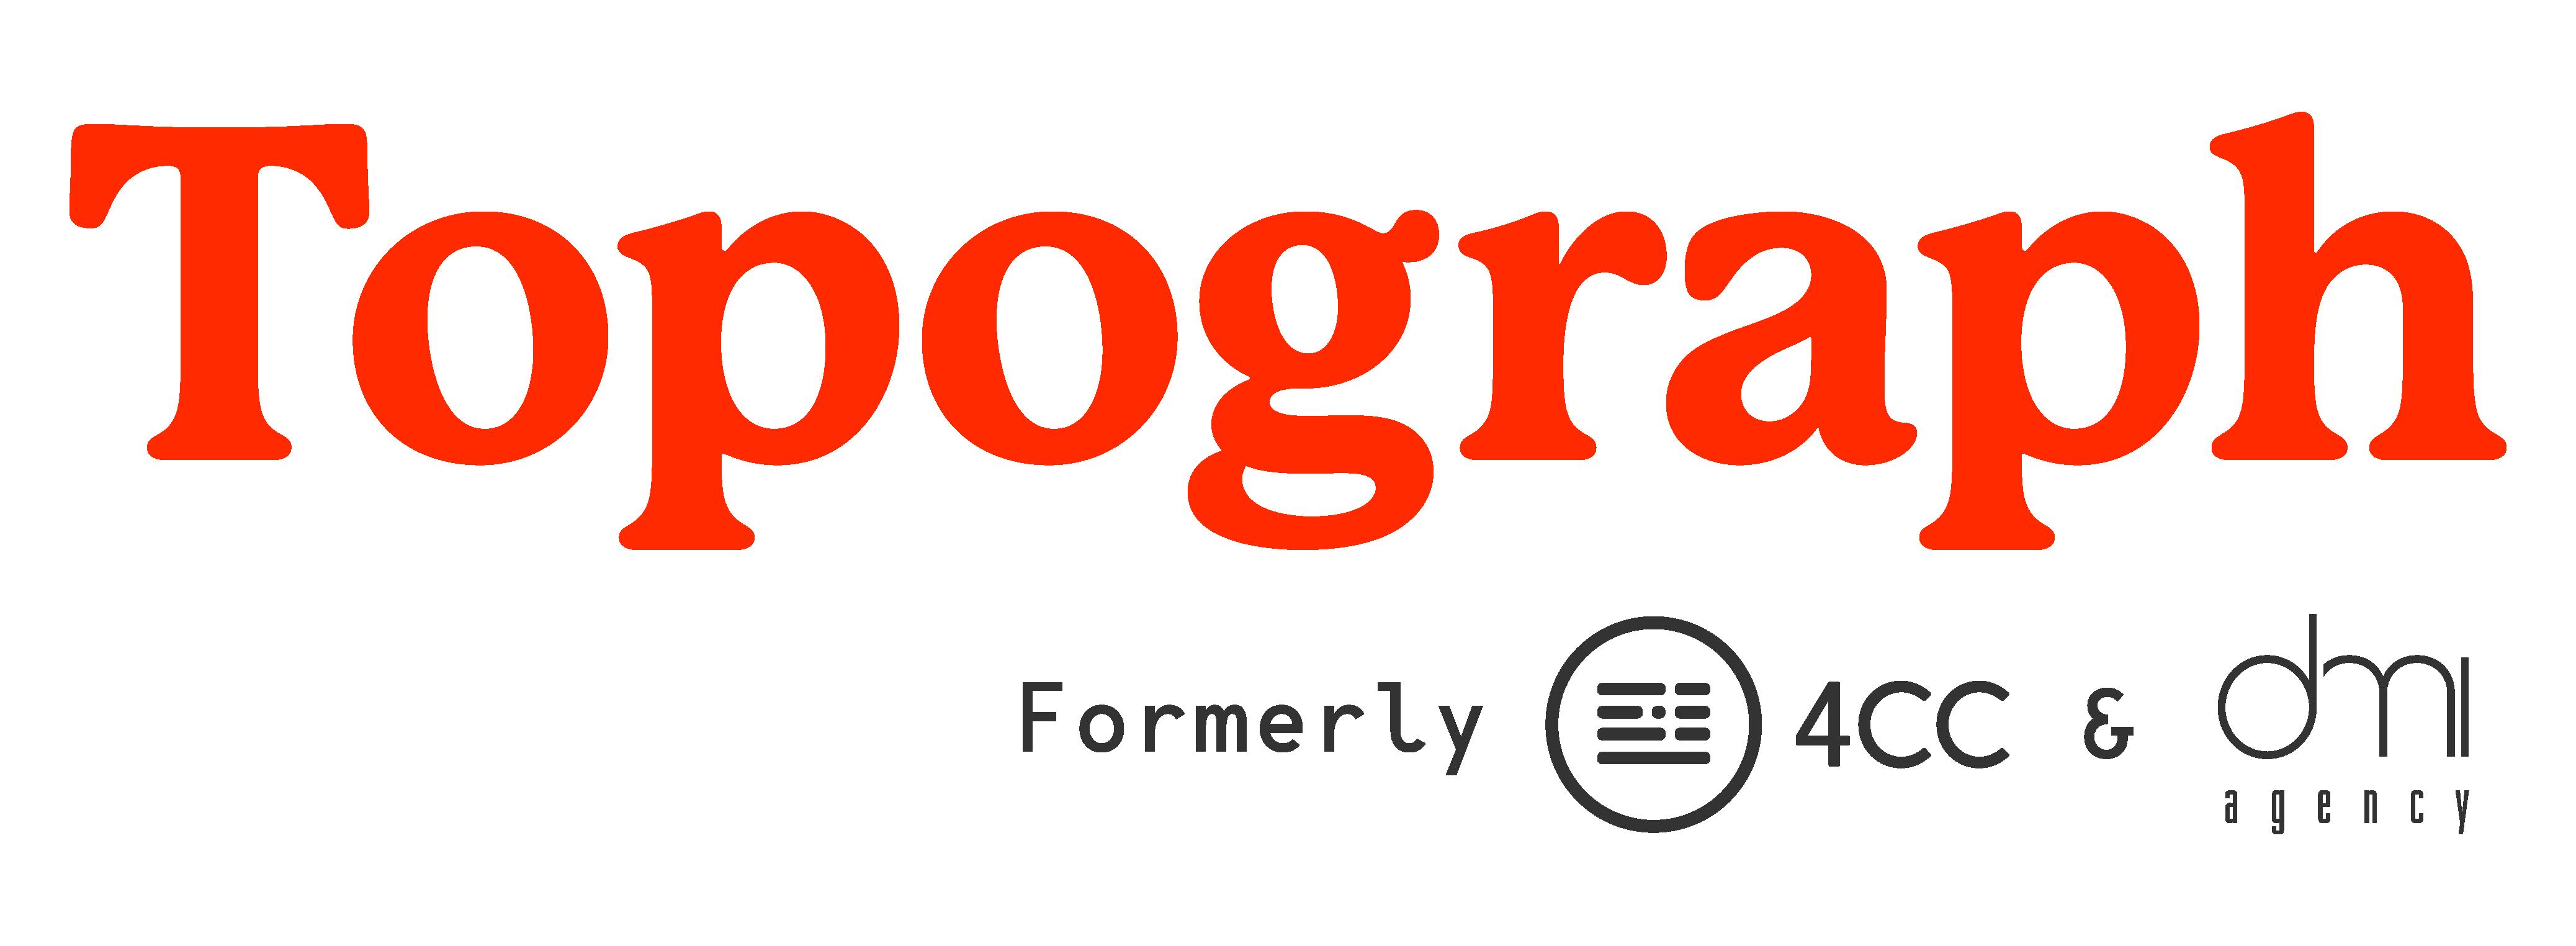 freshbooks-invoice-logo-copy-3